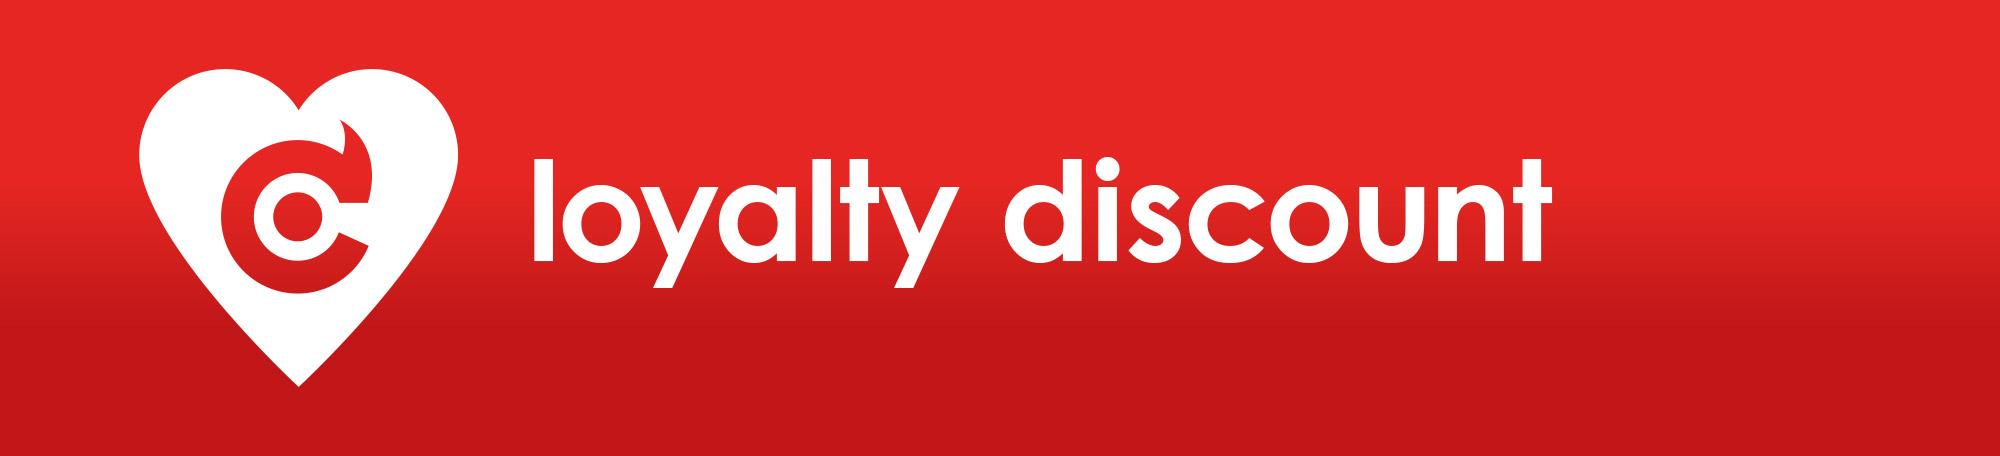 chainwawbars-loyalty-discount